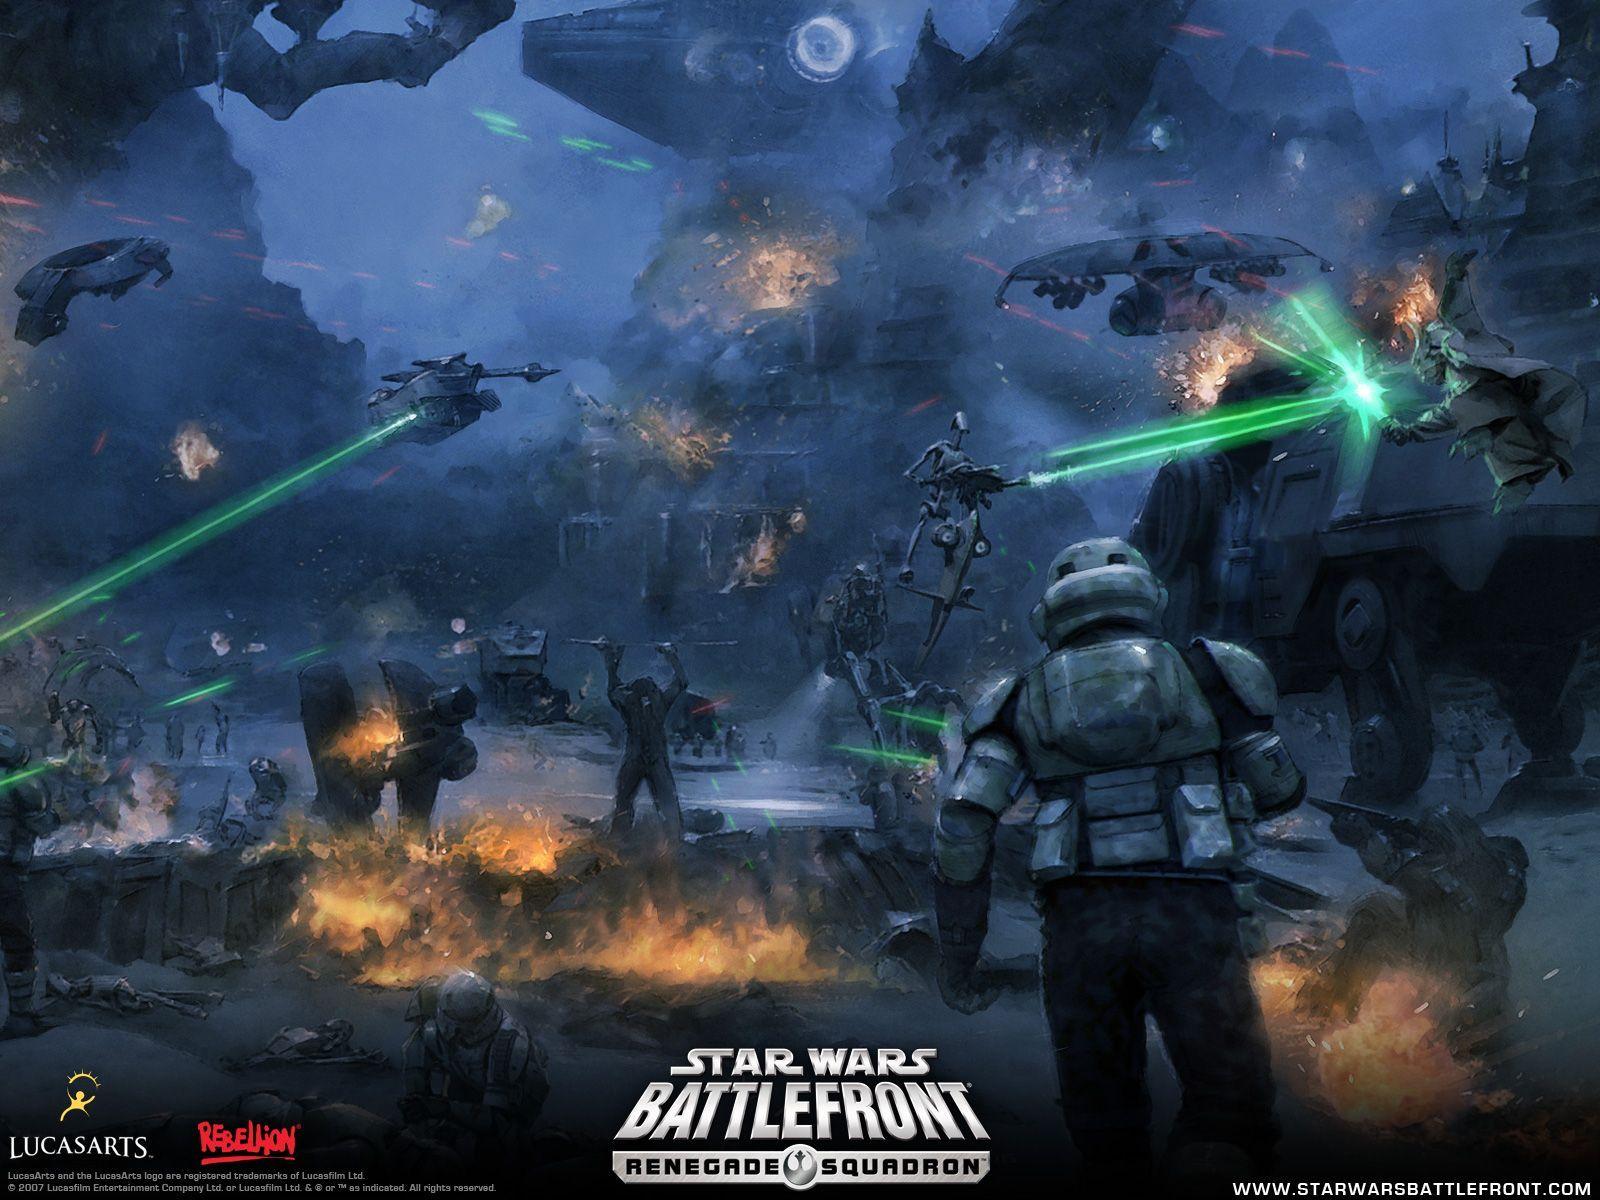 Pin By Anthony Hofer On Star Wars Star Wars Wallpaper Star Wars Clone Wars Ultimate Star Wars